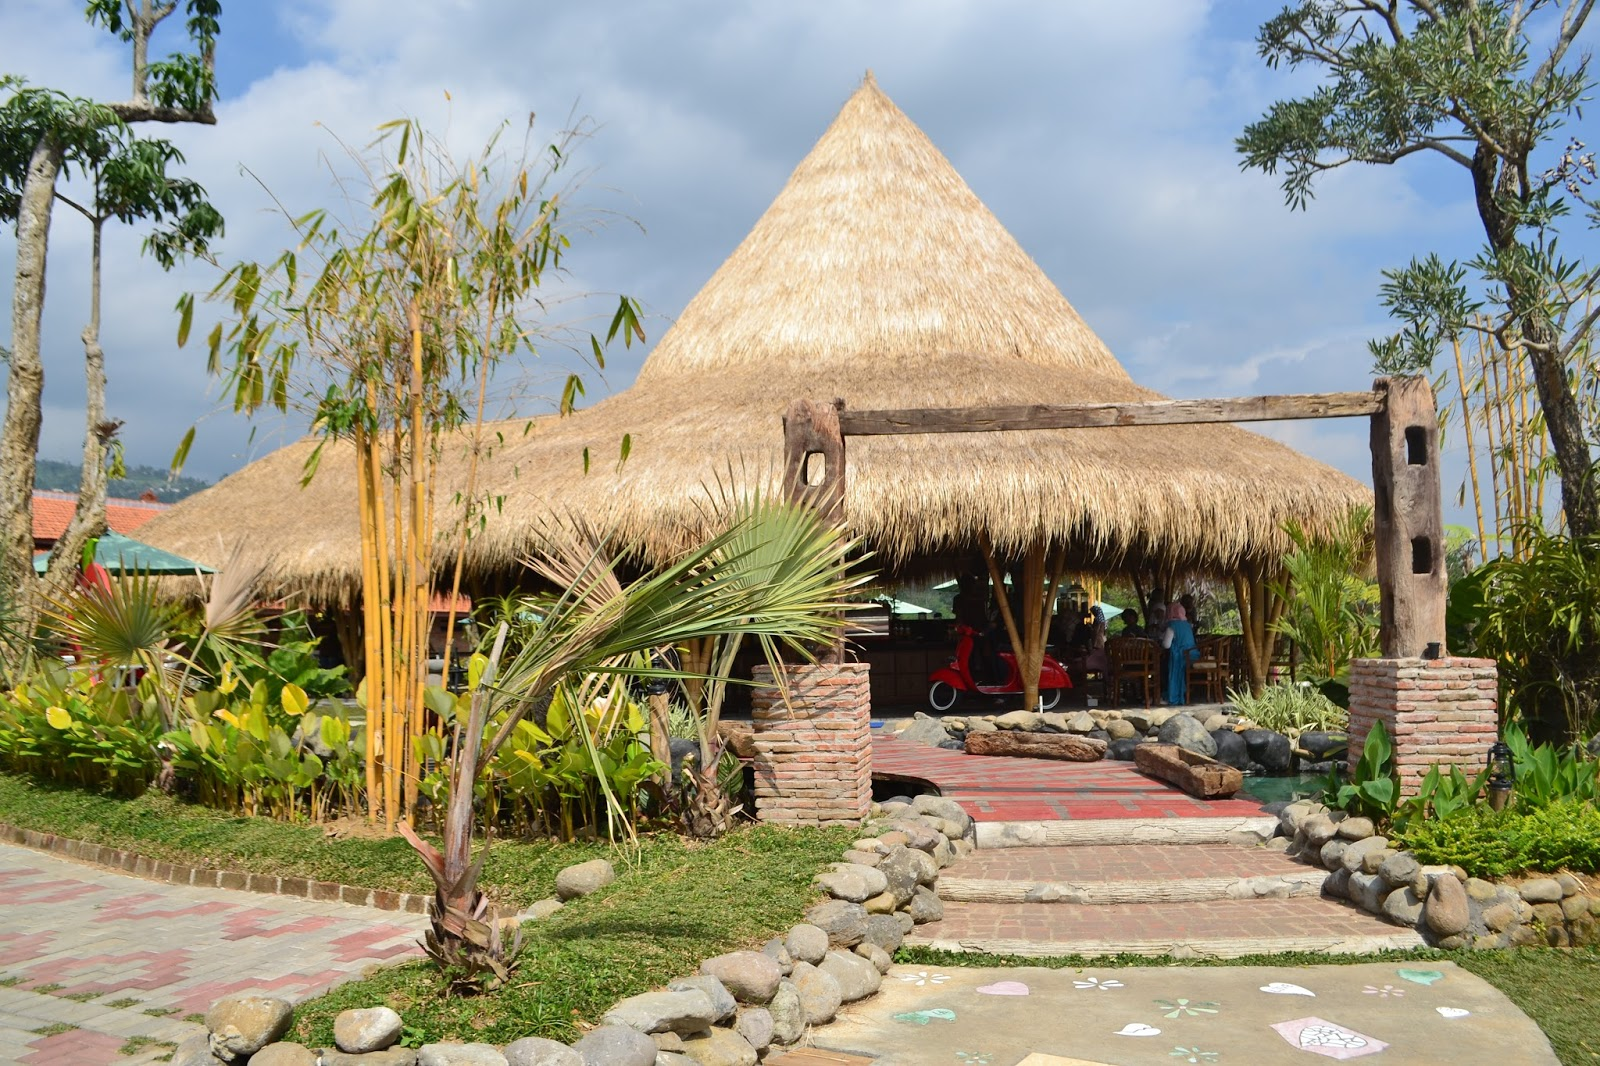 bali ndeso kata yang berasal dari bahasa jawa mempunyai arti kembali ke desa ini digunakan oleh sebuah tempat wisata kuliner berkonsep resto